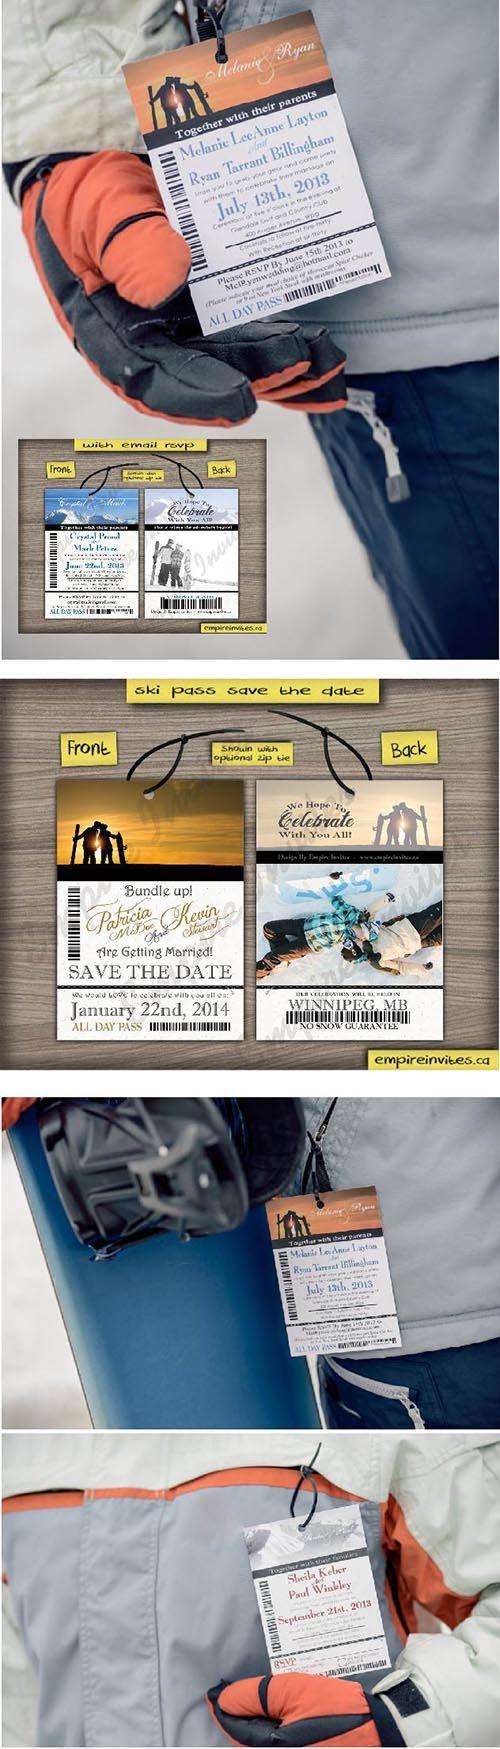 LOVE!! - 100% customizable by www.empireinvites.ca! Ski Pass / Lift Ticket Save The Date Wedding Passes